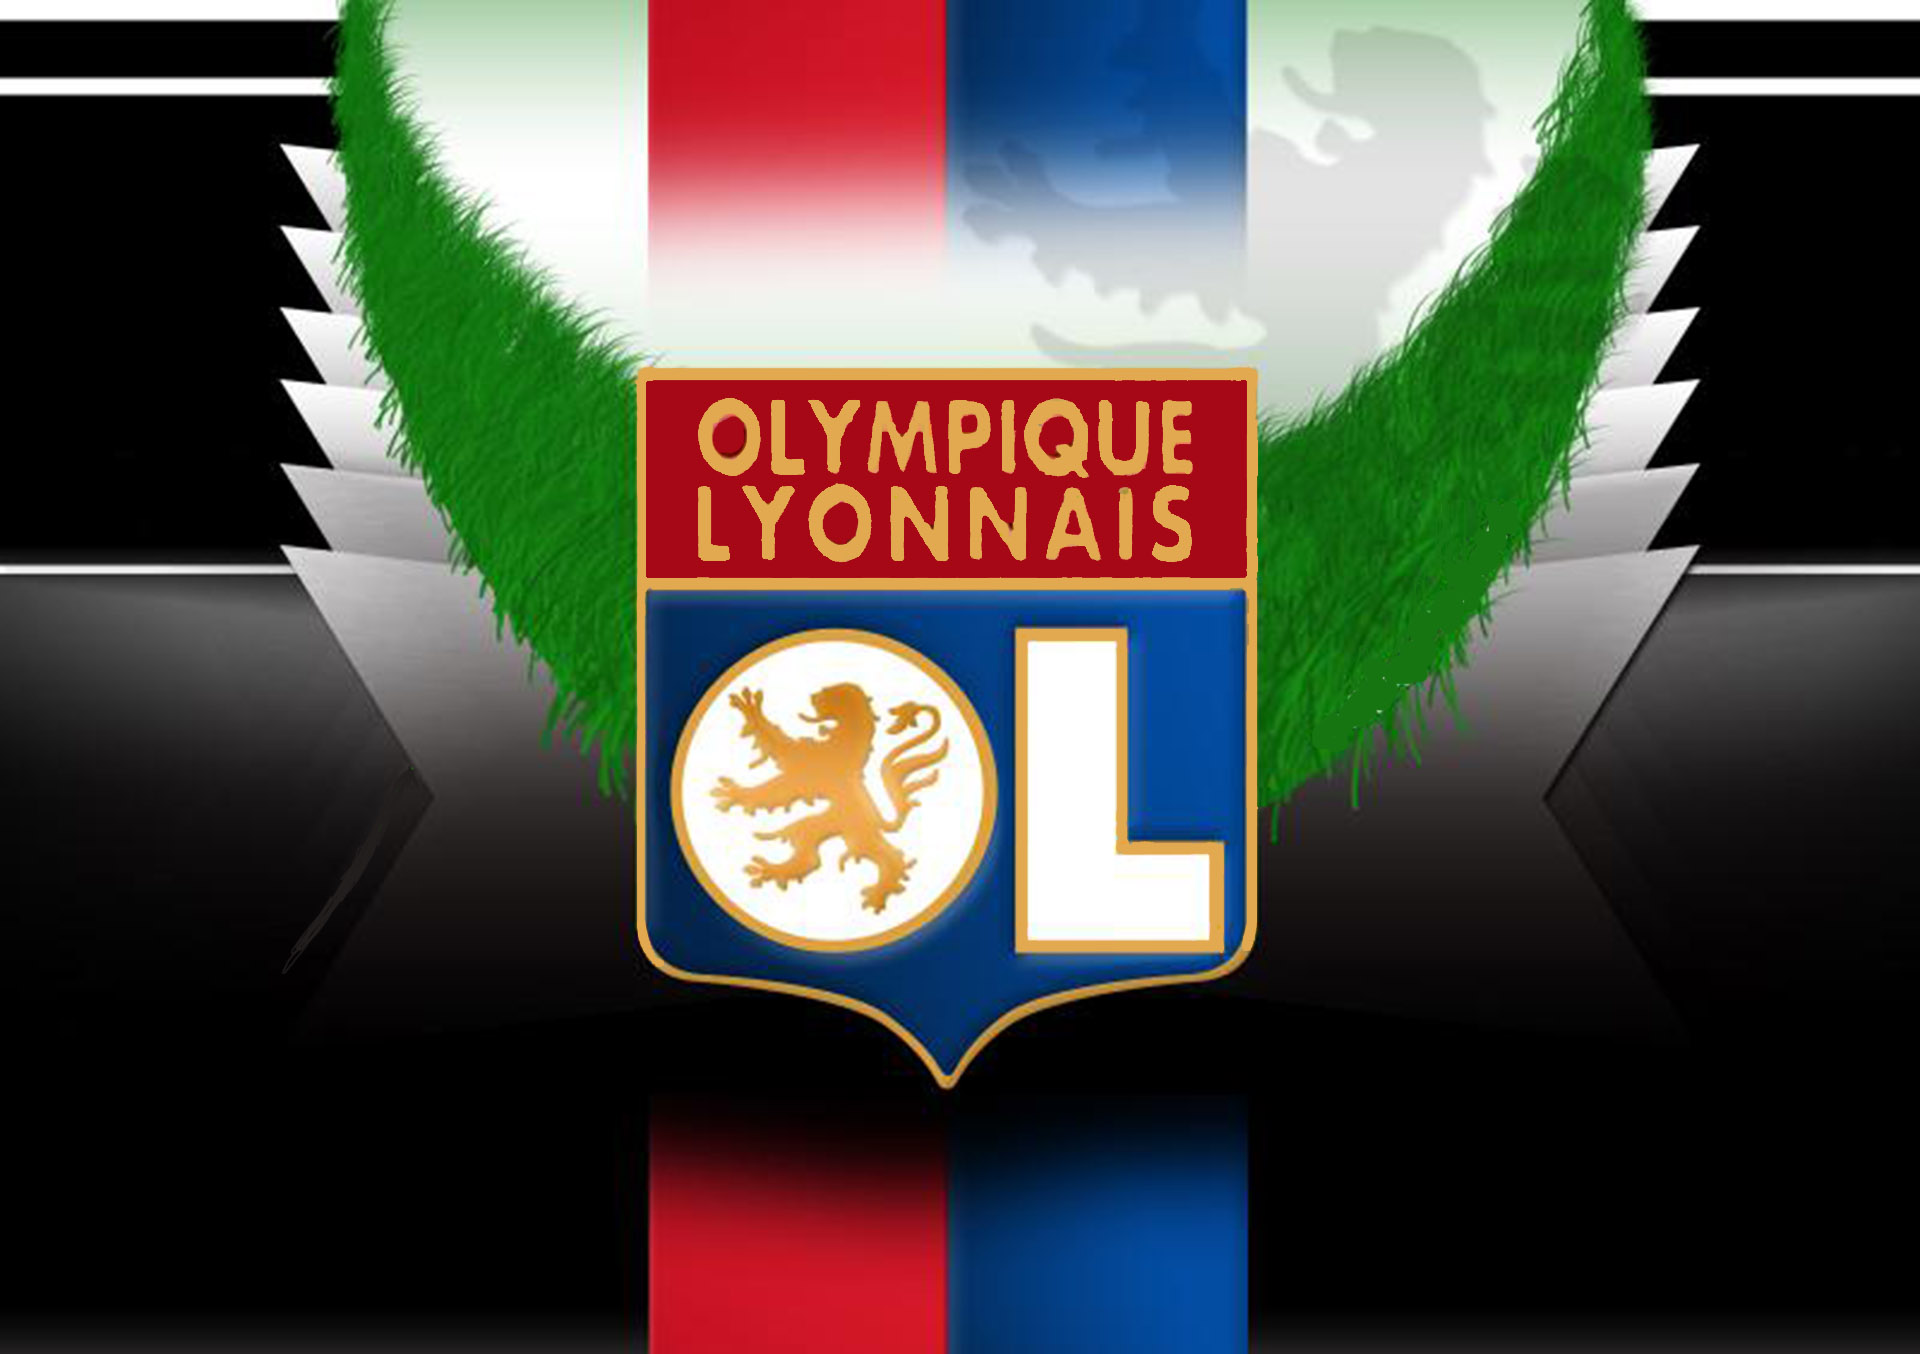 olympique Lyonnais Wallpaper hd